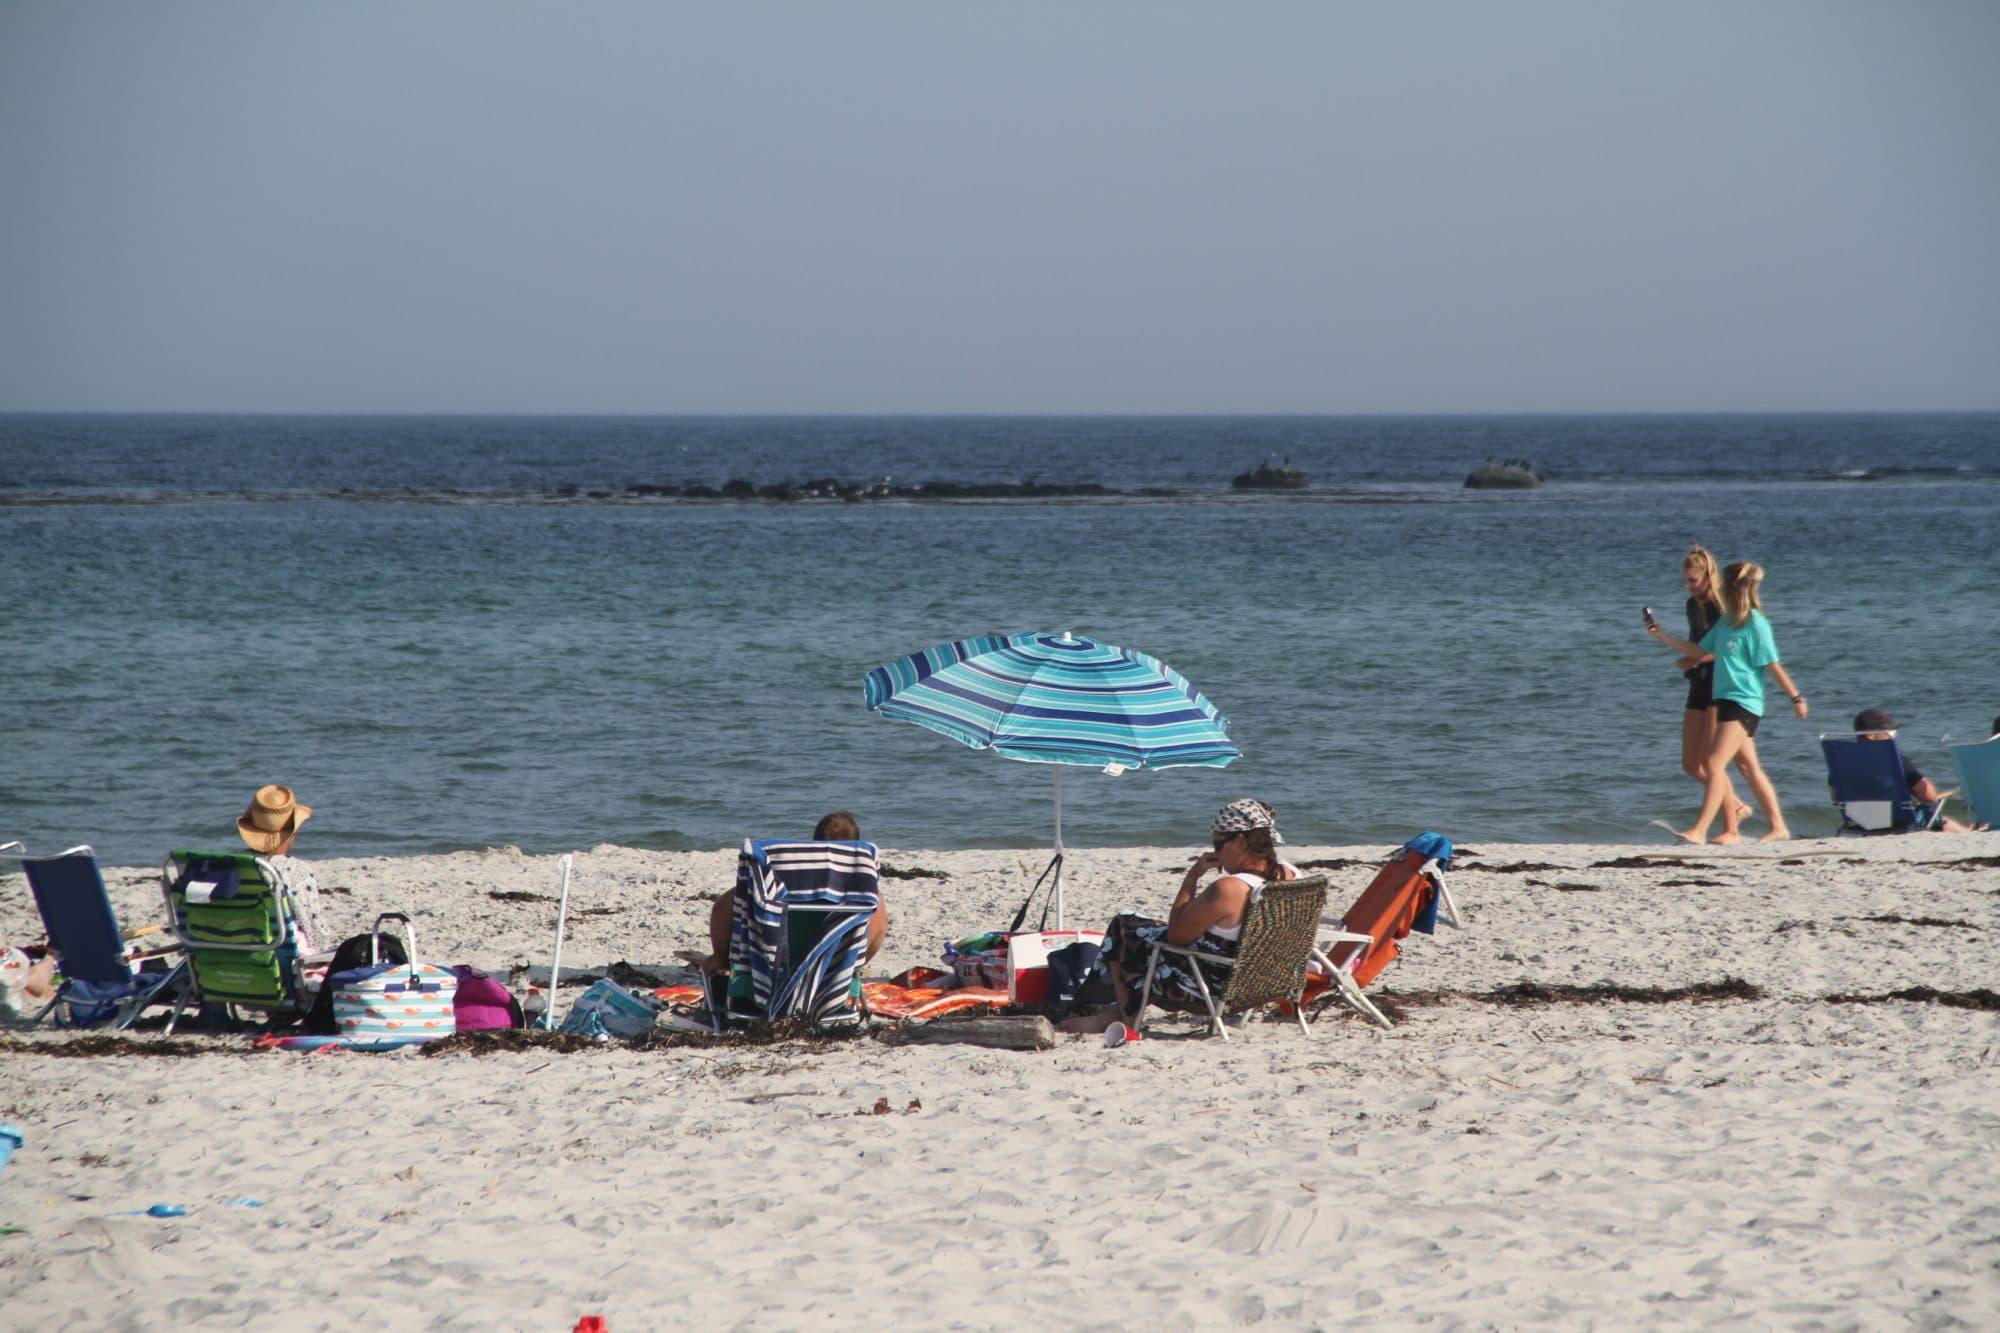 goose-rocks-beach-umbrella2